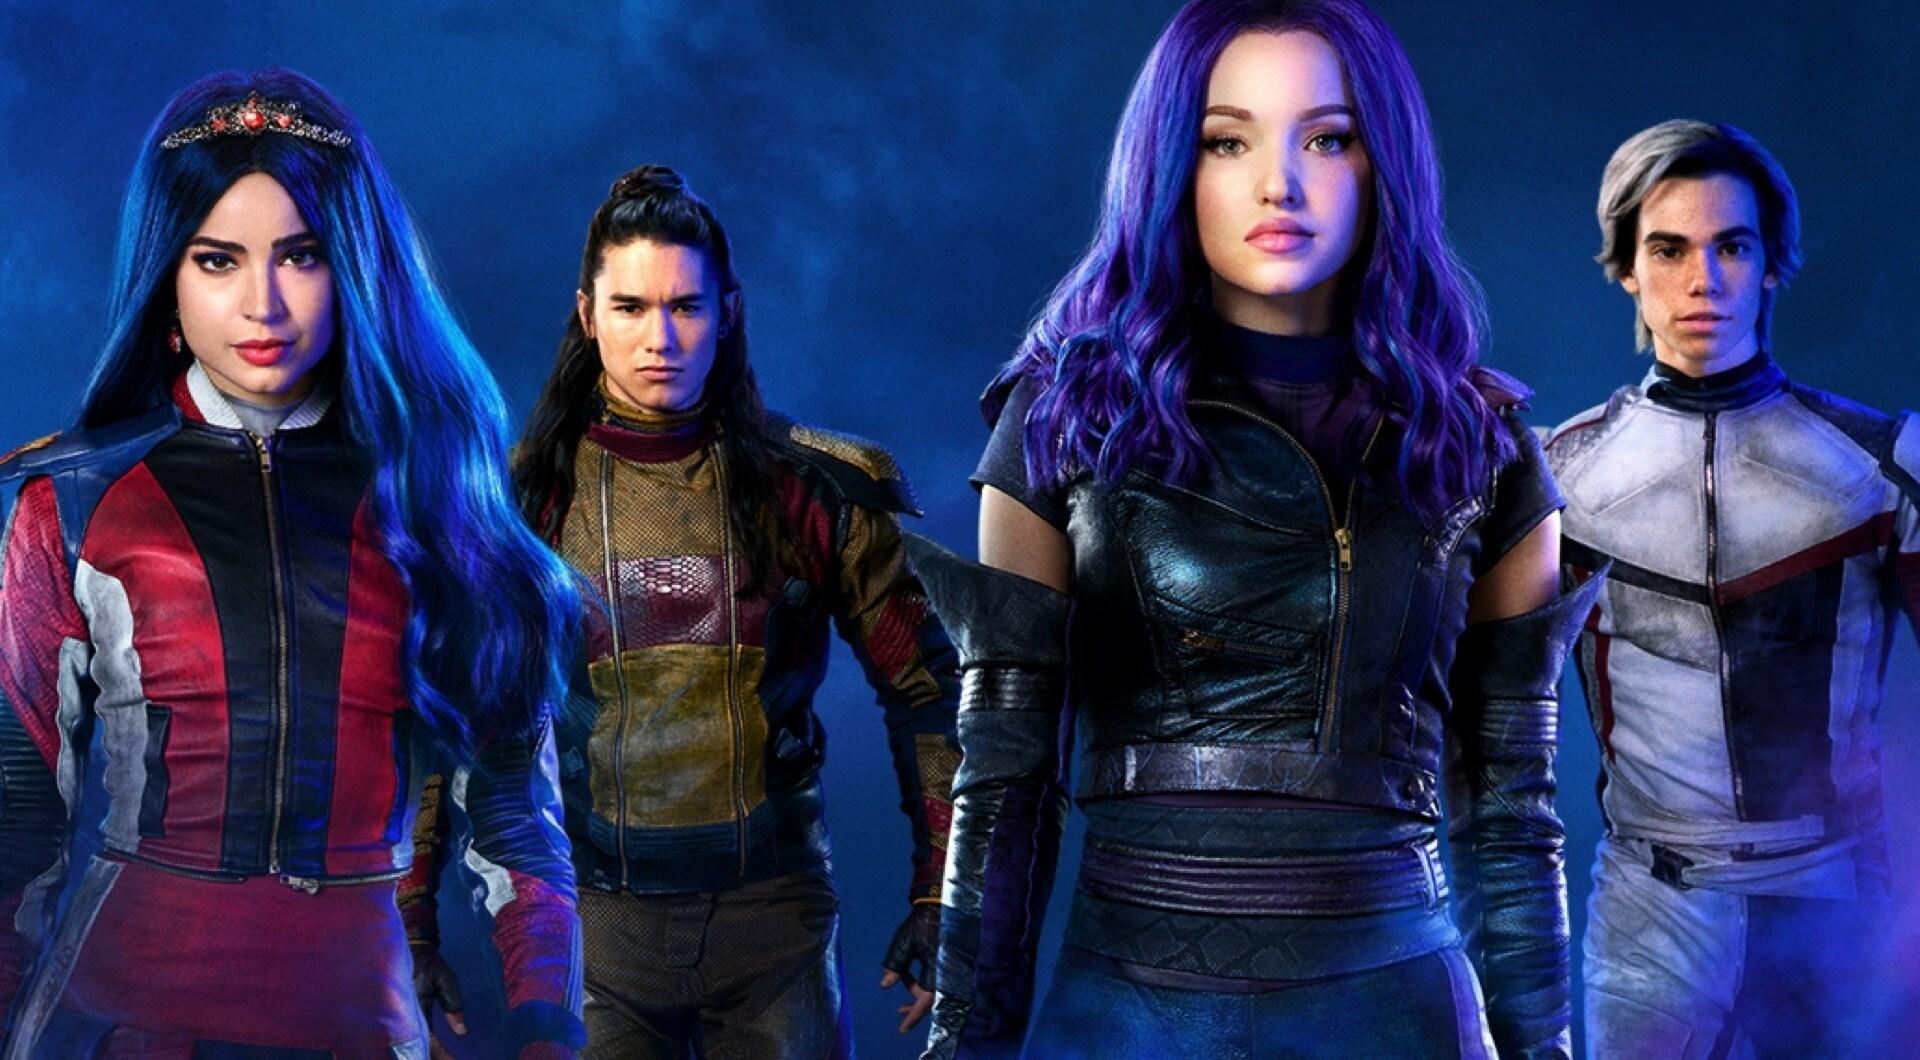 Cast poster from Descendants 3